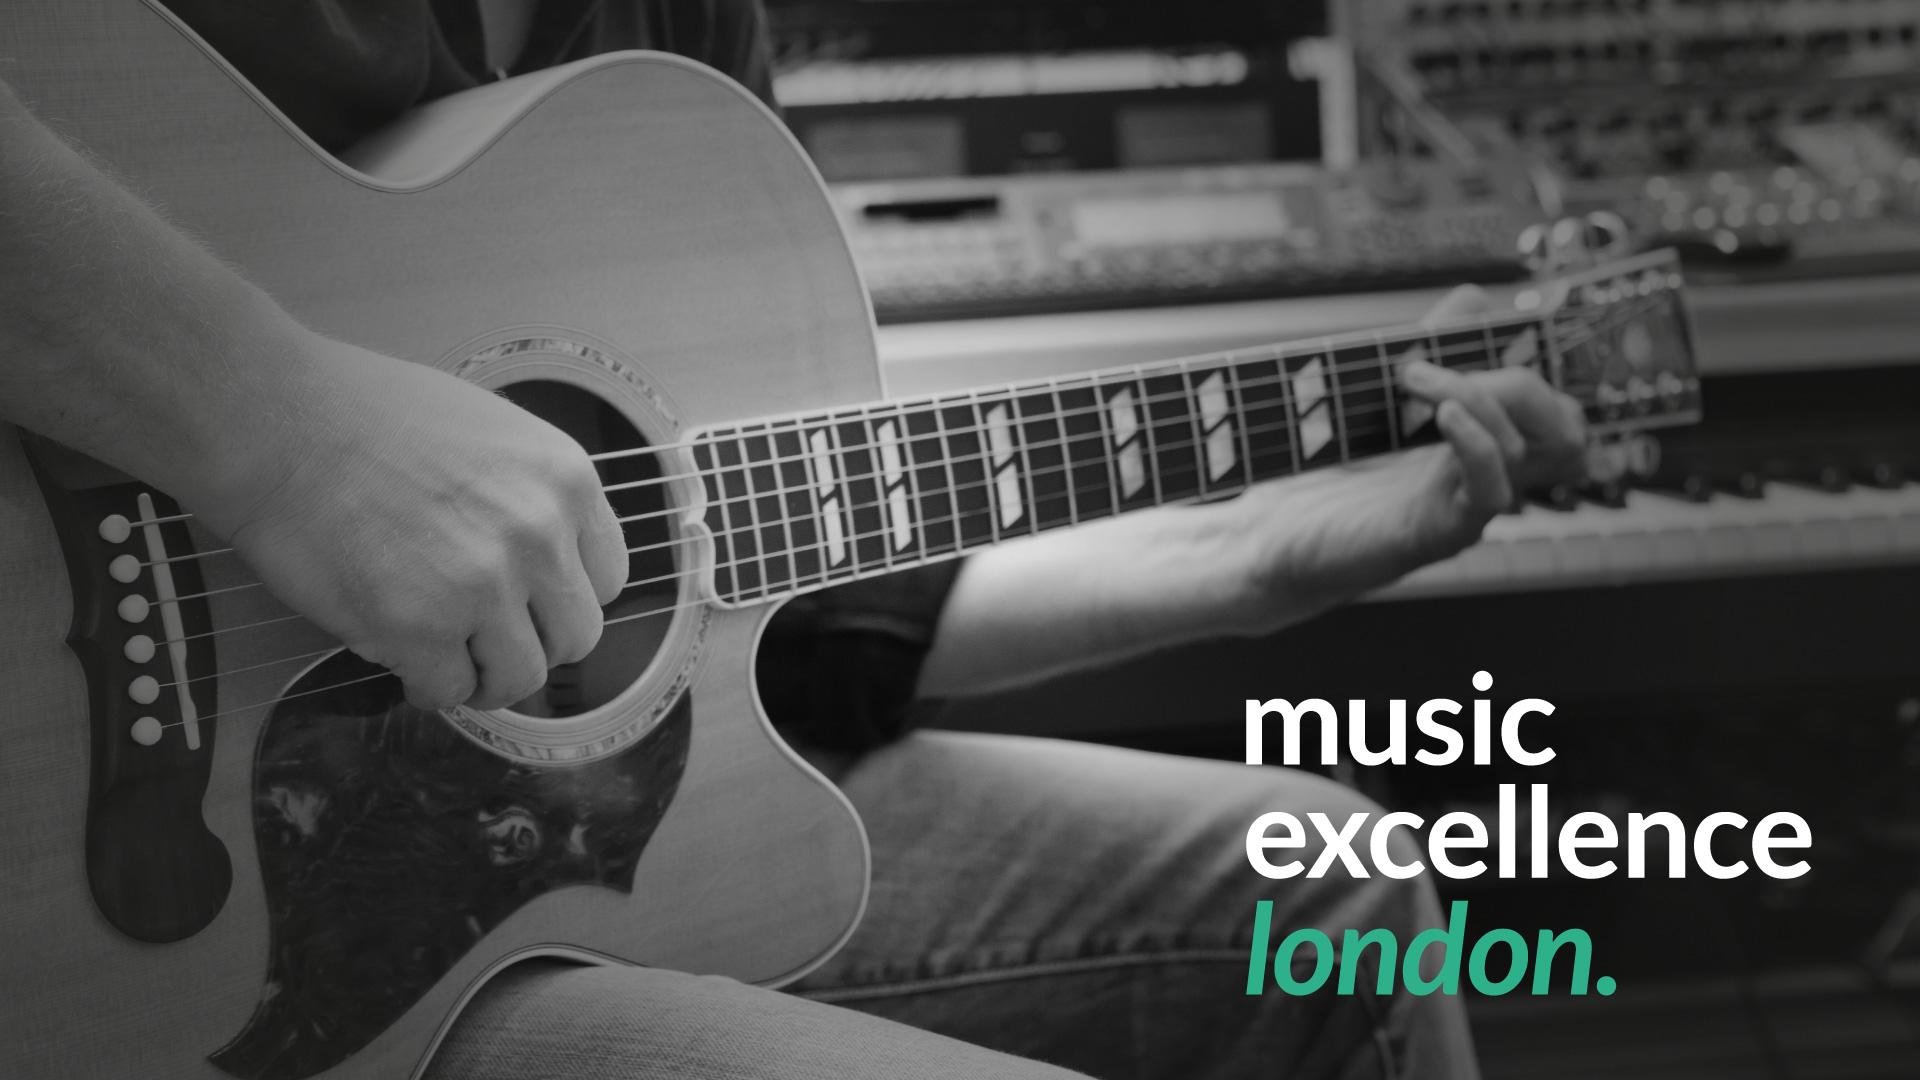 Music education website and logo design